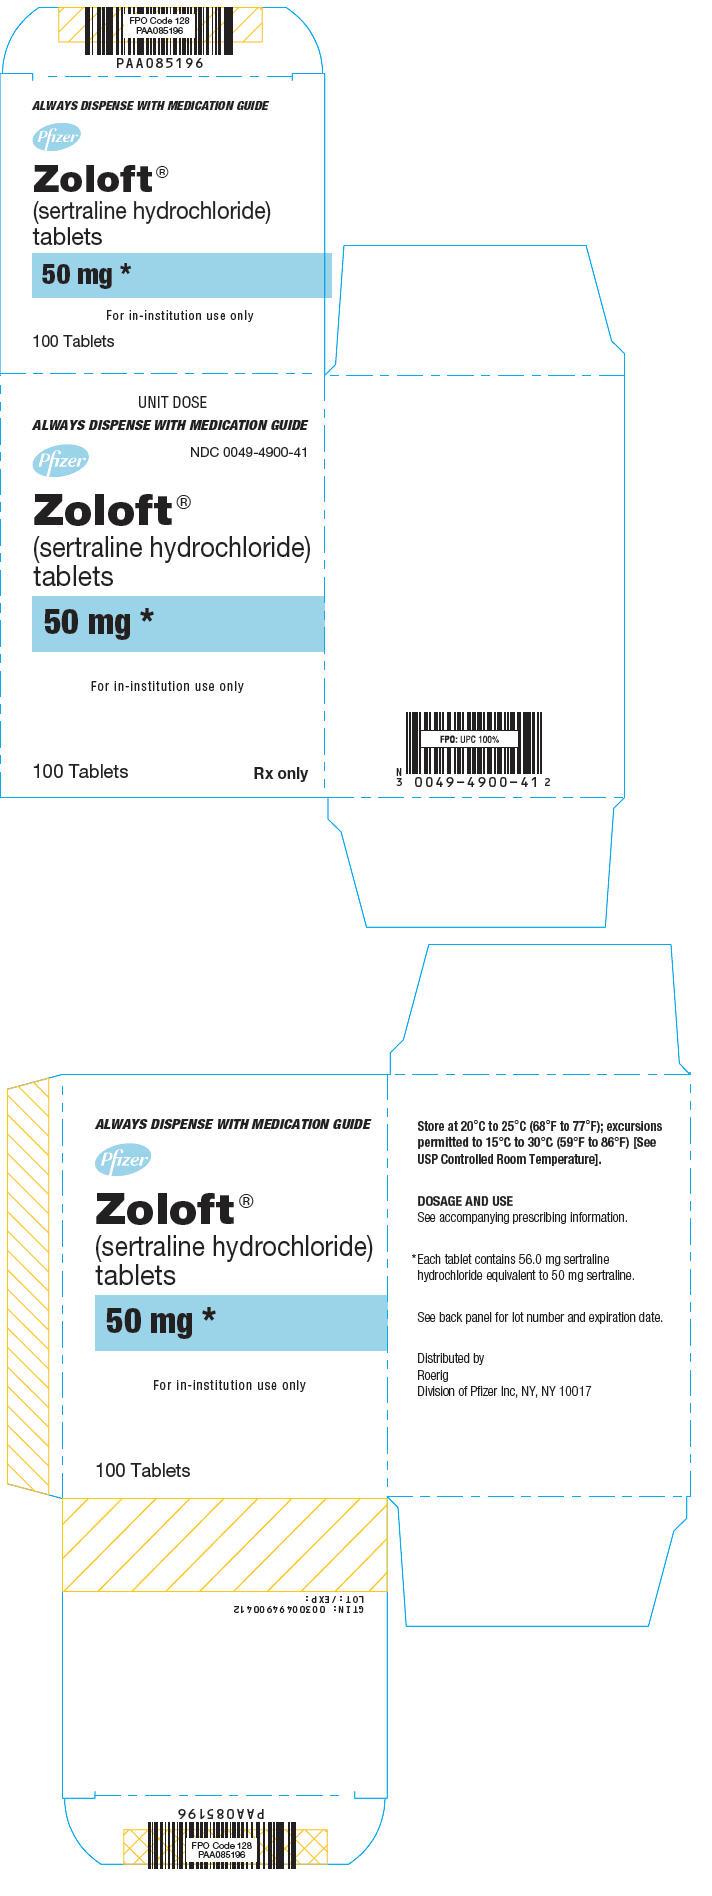 PRINCIPAL DISPLAY PANEL - 50 mg Tablet Blister Pack Carton